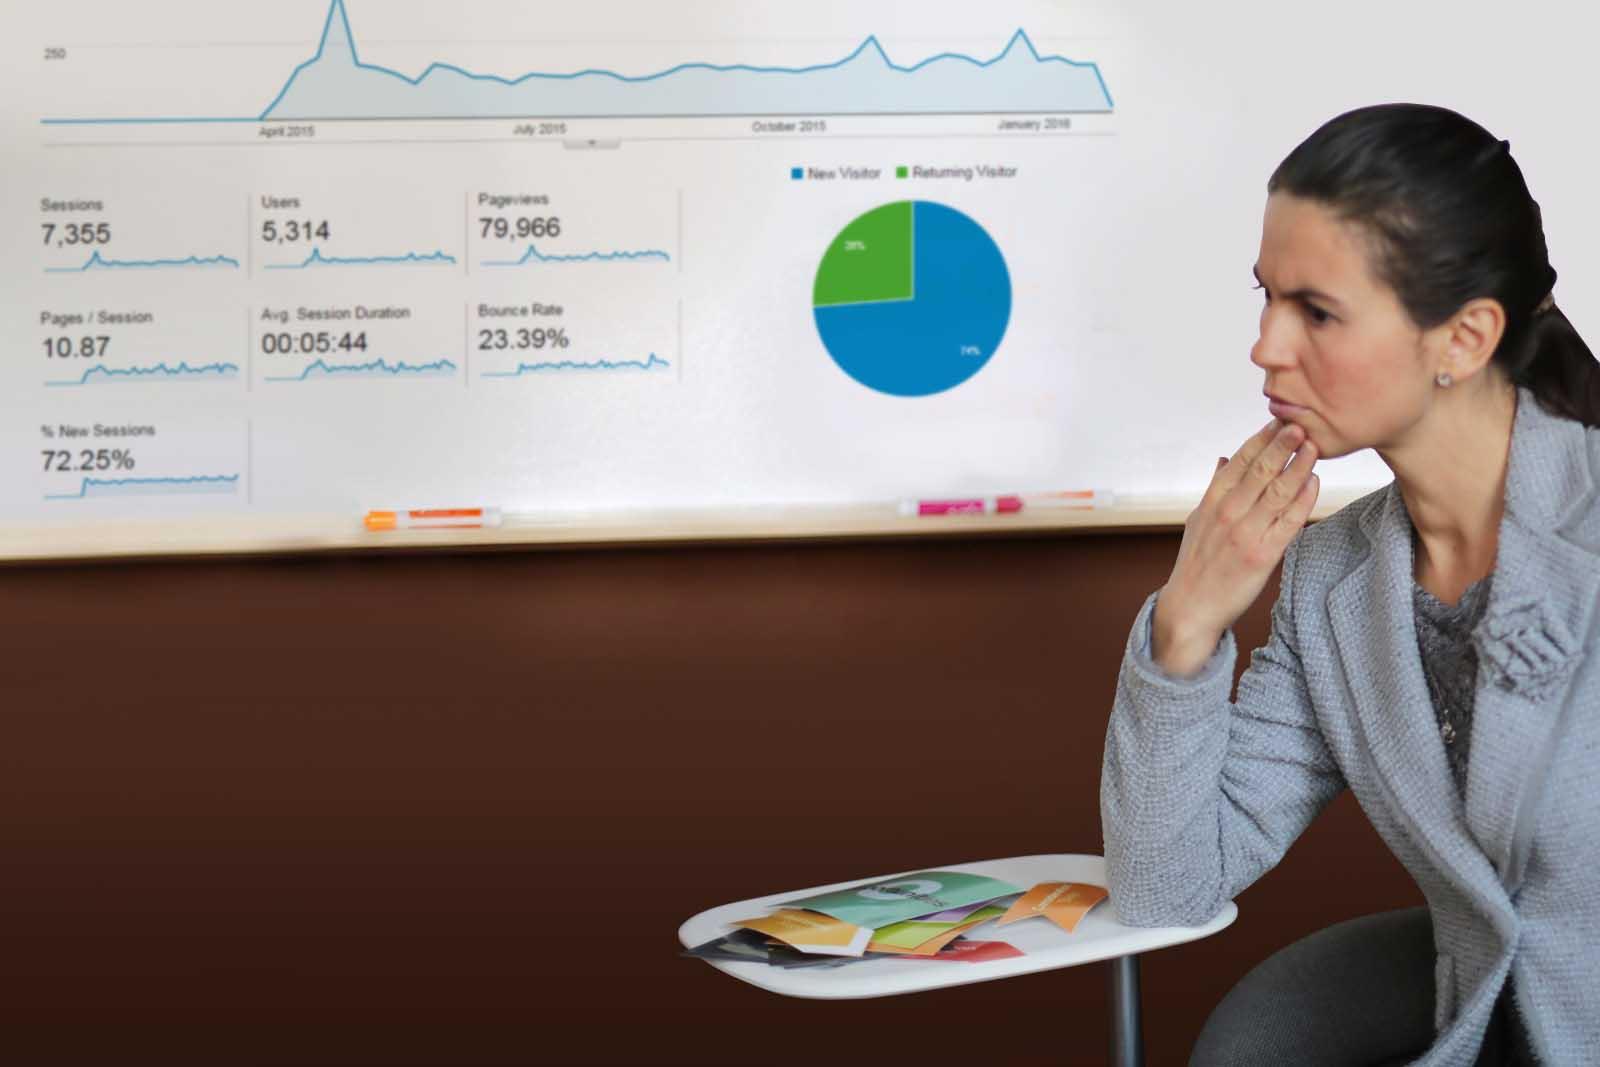 How to Measure Your Website's Performance: Best Metrics & KPIs